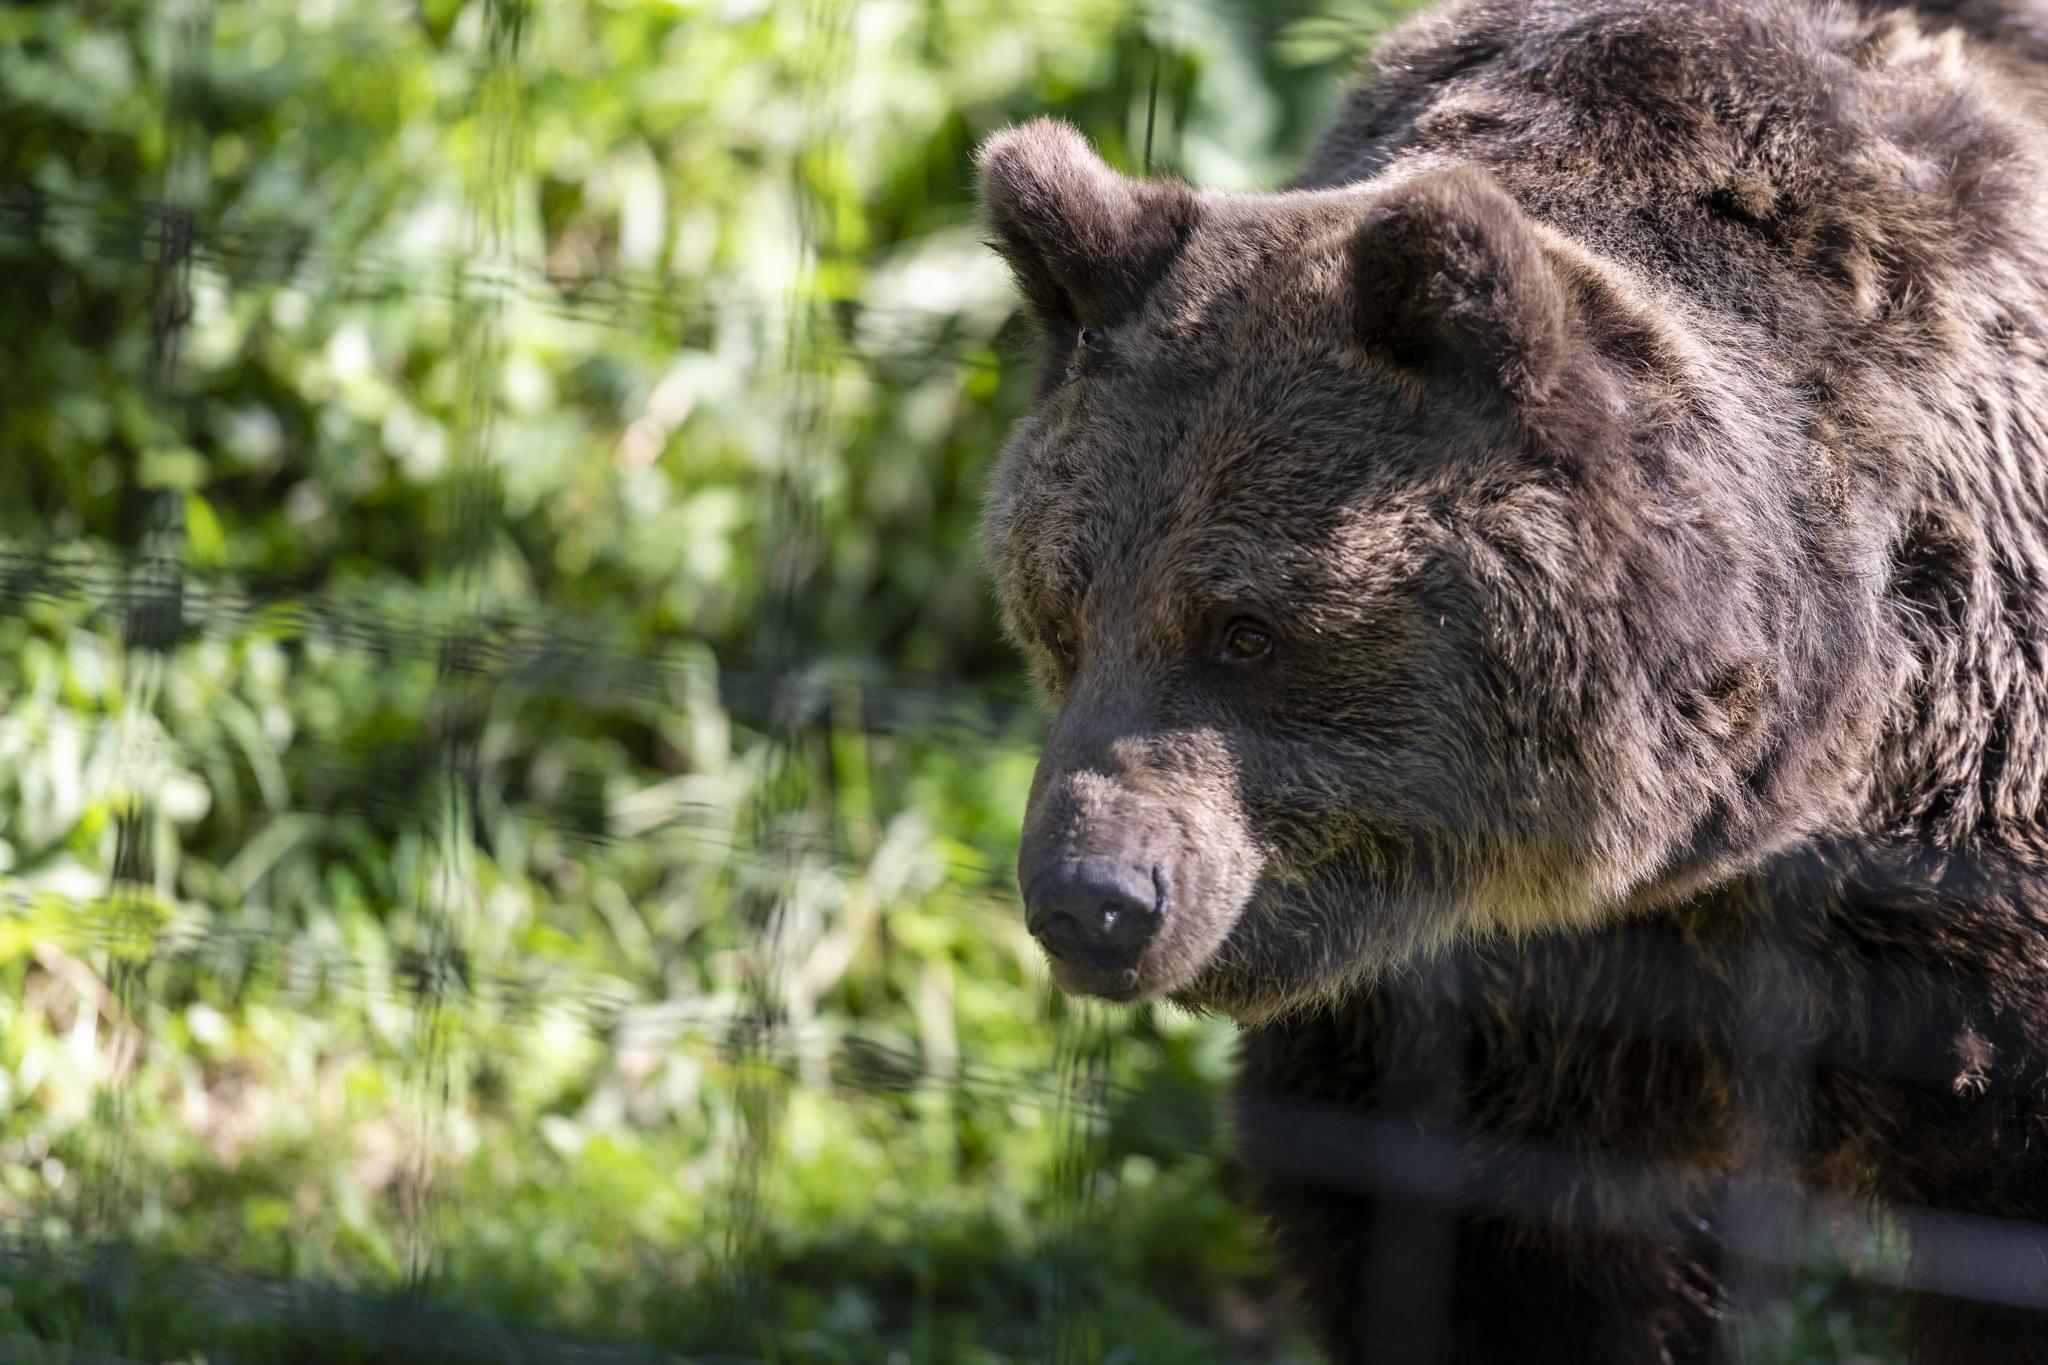 Braunbärenreservat bei Zărnești / Rumänien Reisebericht